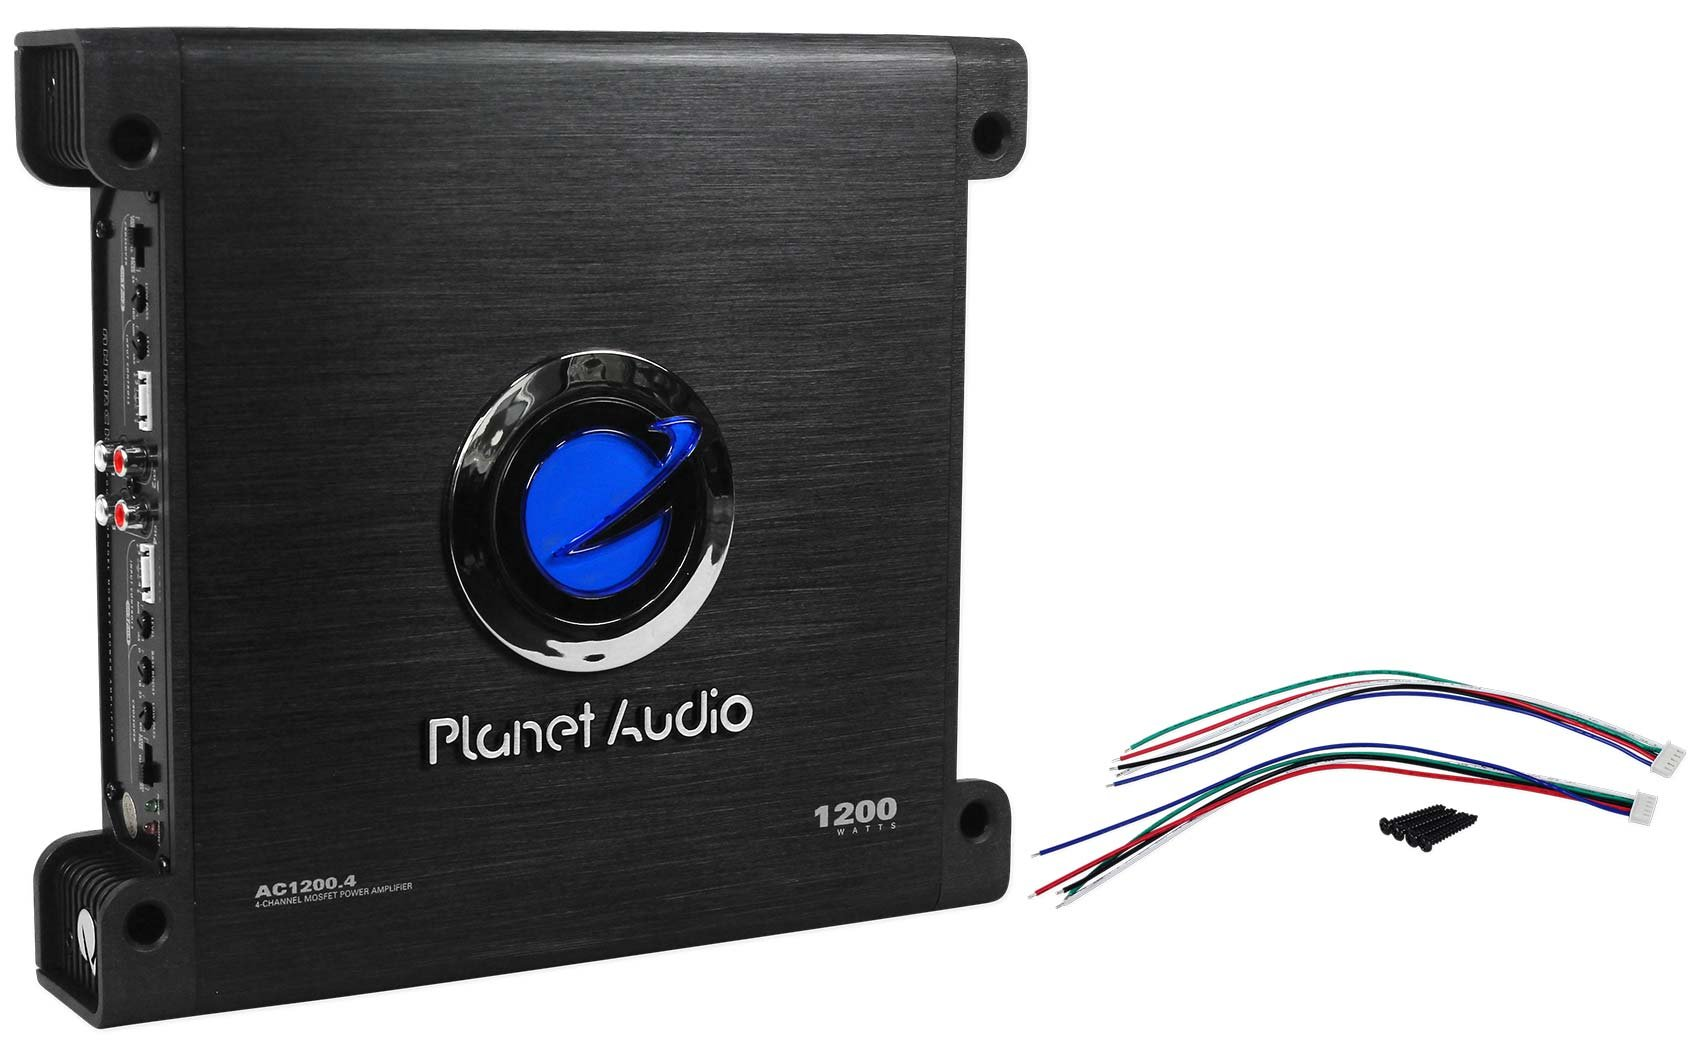 Planet Audio Anarchy AC1200.4 1200 Watt 4 Channel Car Amplifier+Amp Kit by Planet Audio (Image #2)